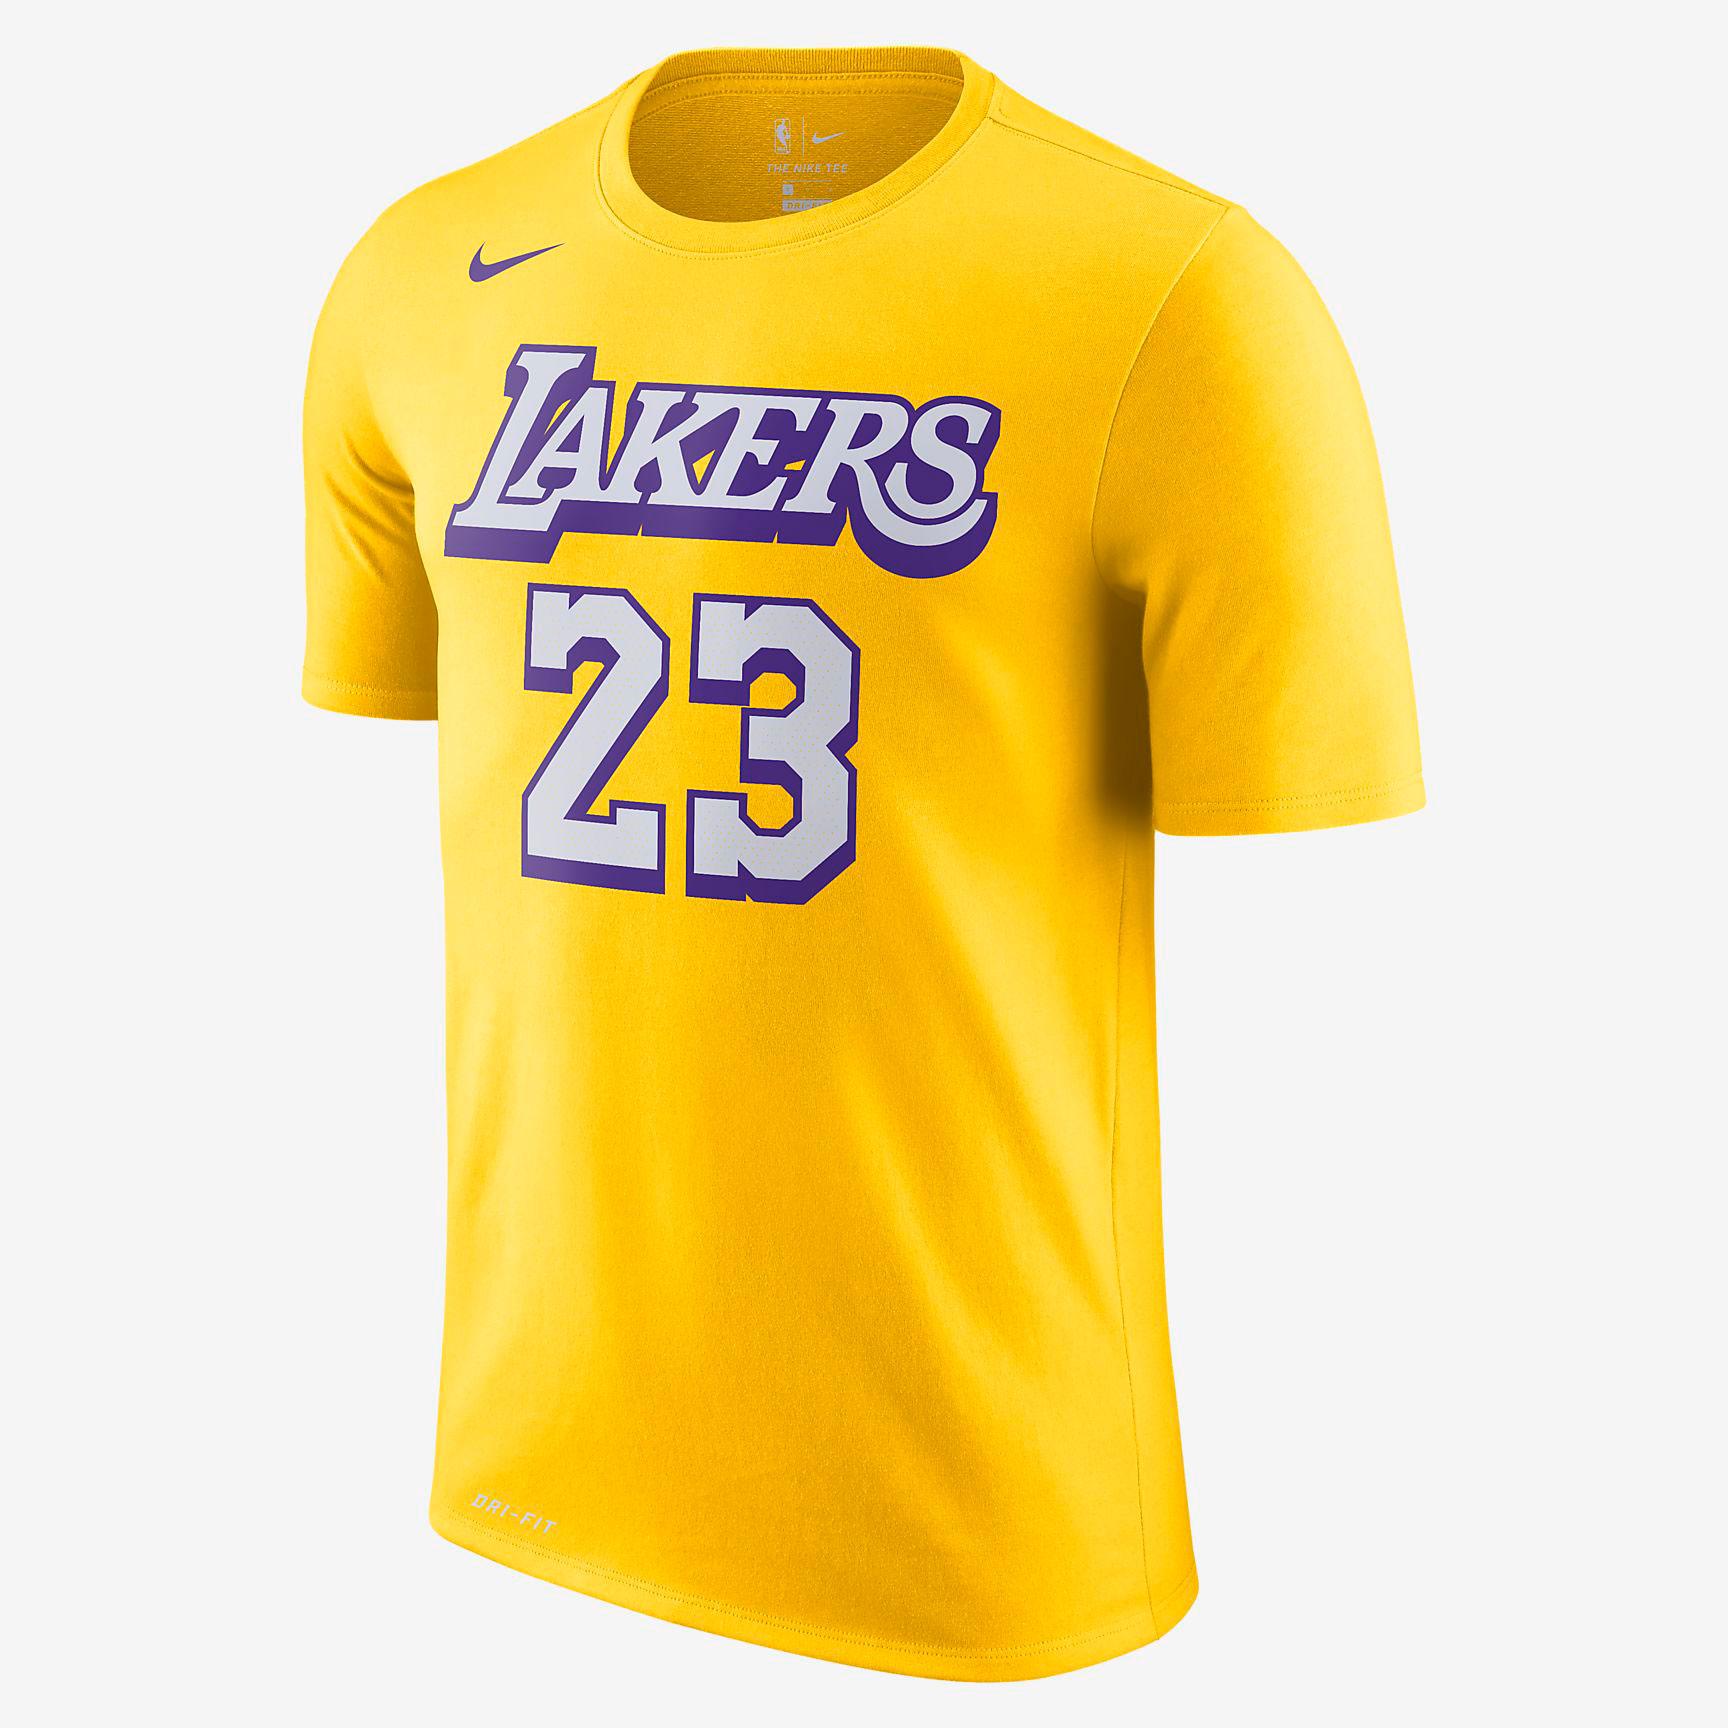 nike-lebron-lakers-city-edition-shirt-1